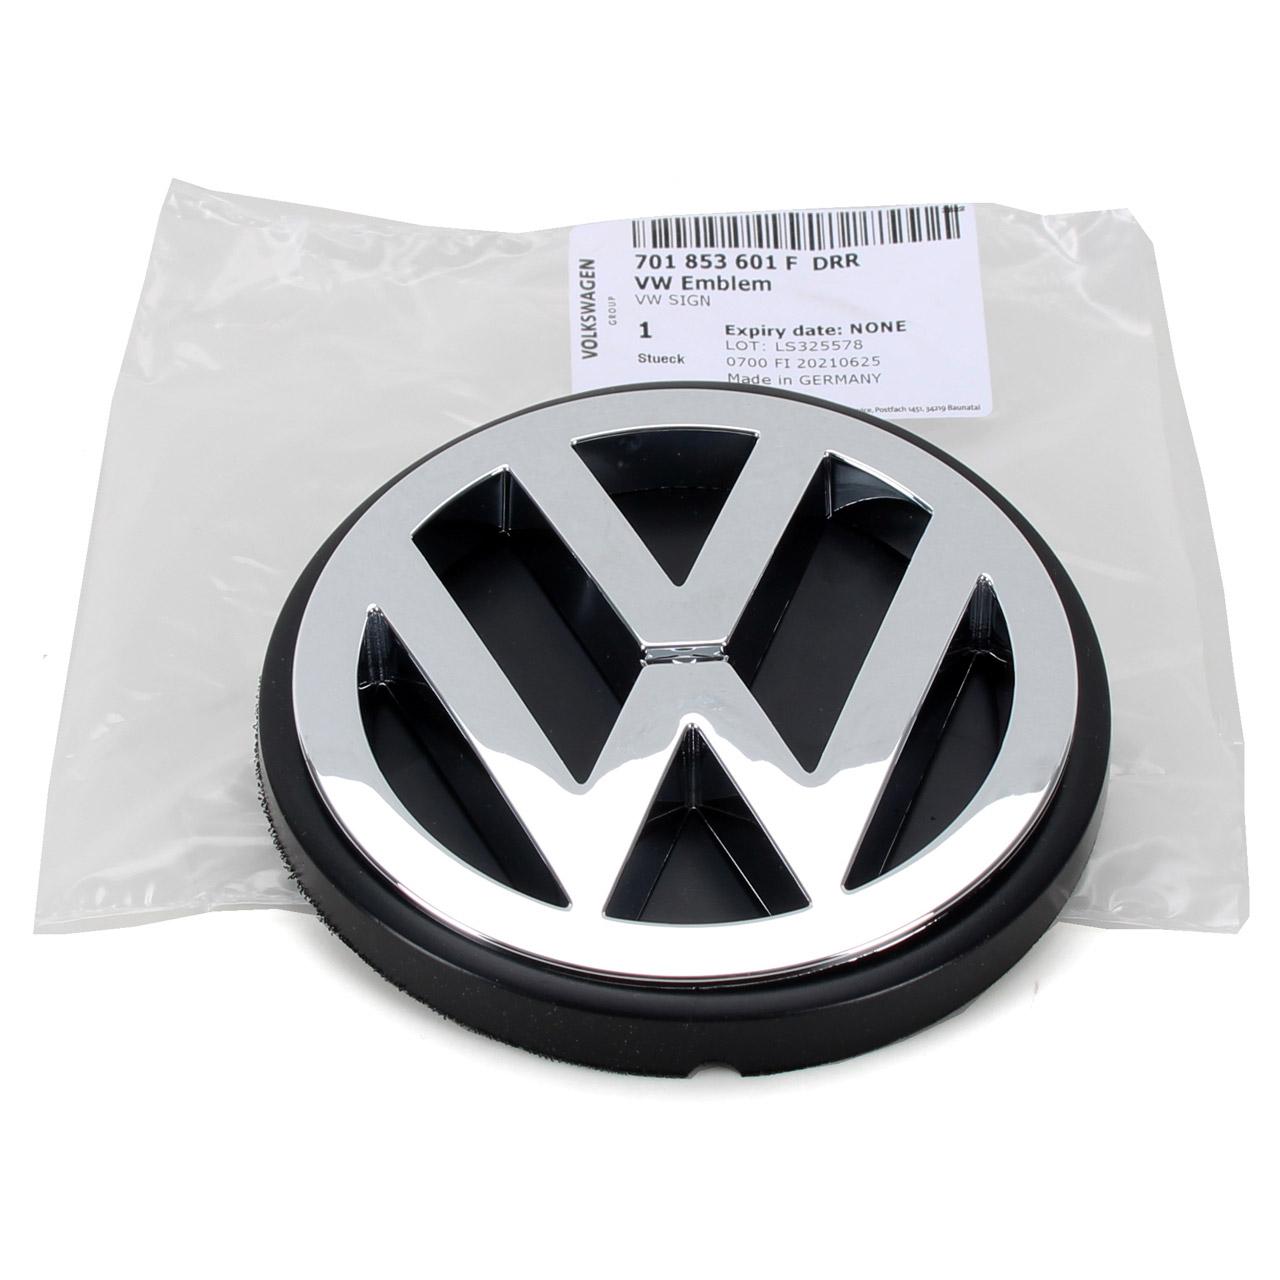 ORIGINAL VW Emblem Logo Heckklappe Transporter T4 hinten 701853601F DRR